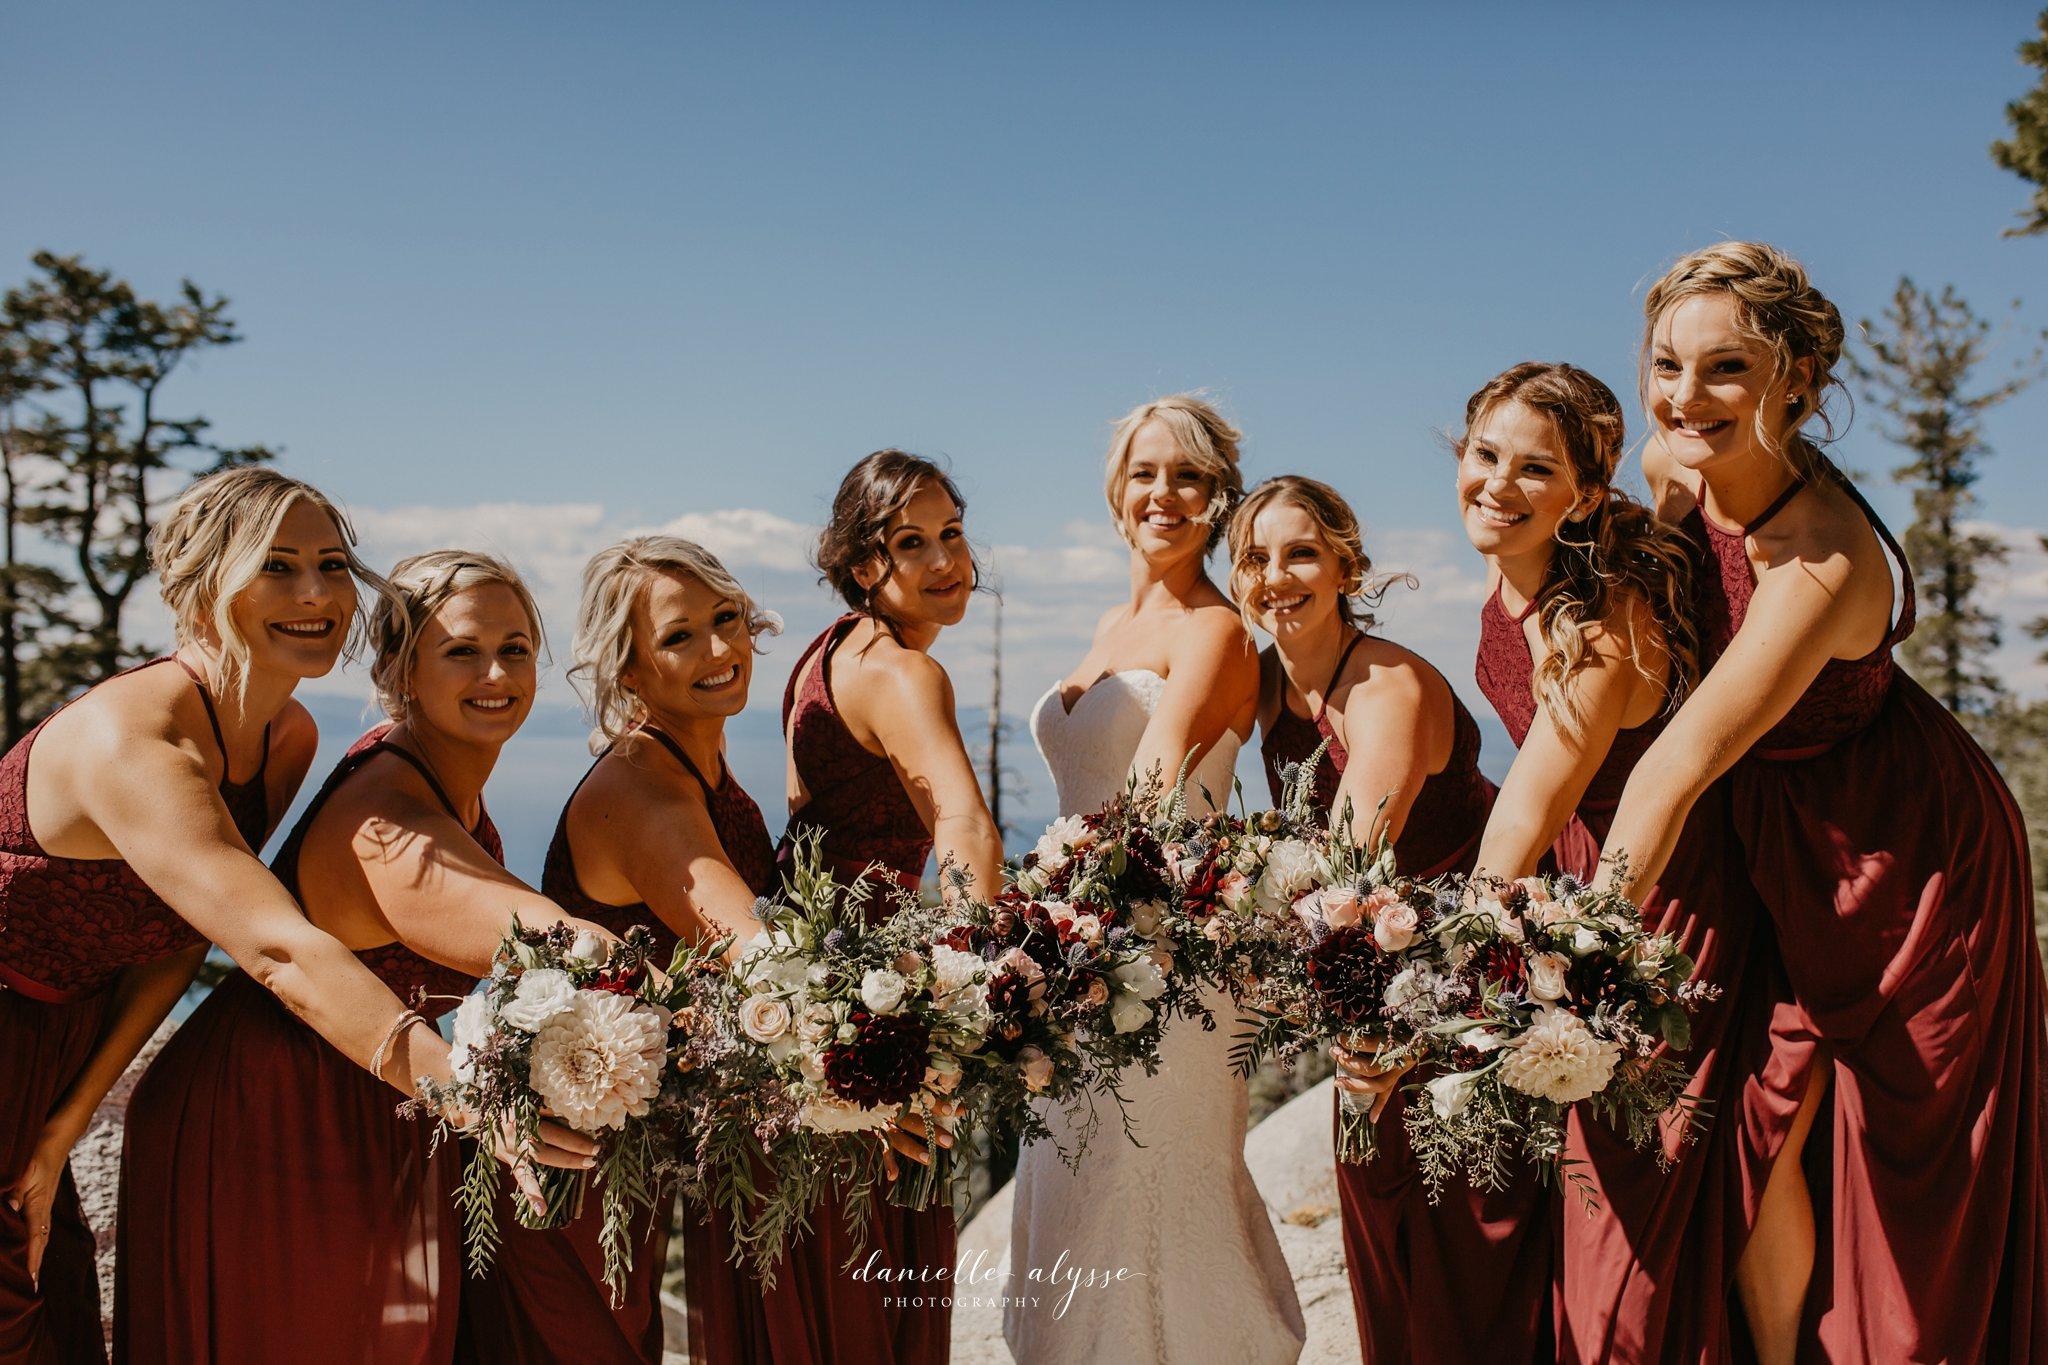 180831_wedding_stephanie_heavenly_south_lake_tahoe_danielle_alysse_photography_destination_blog_281_WEB.jpg